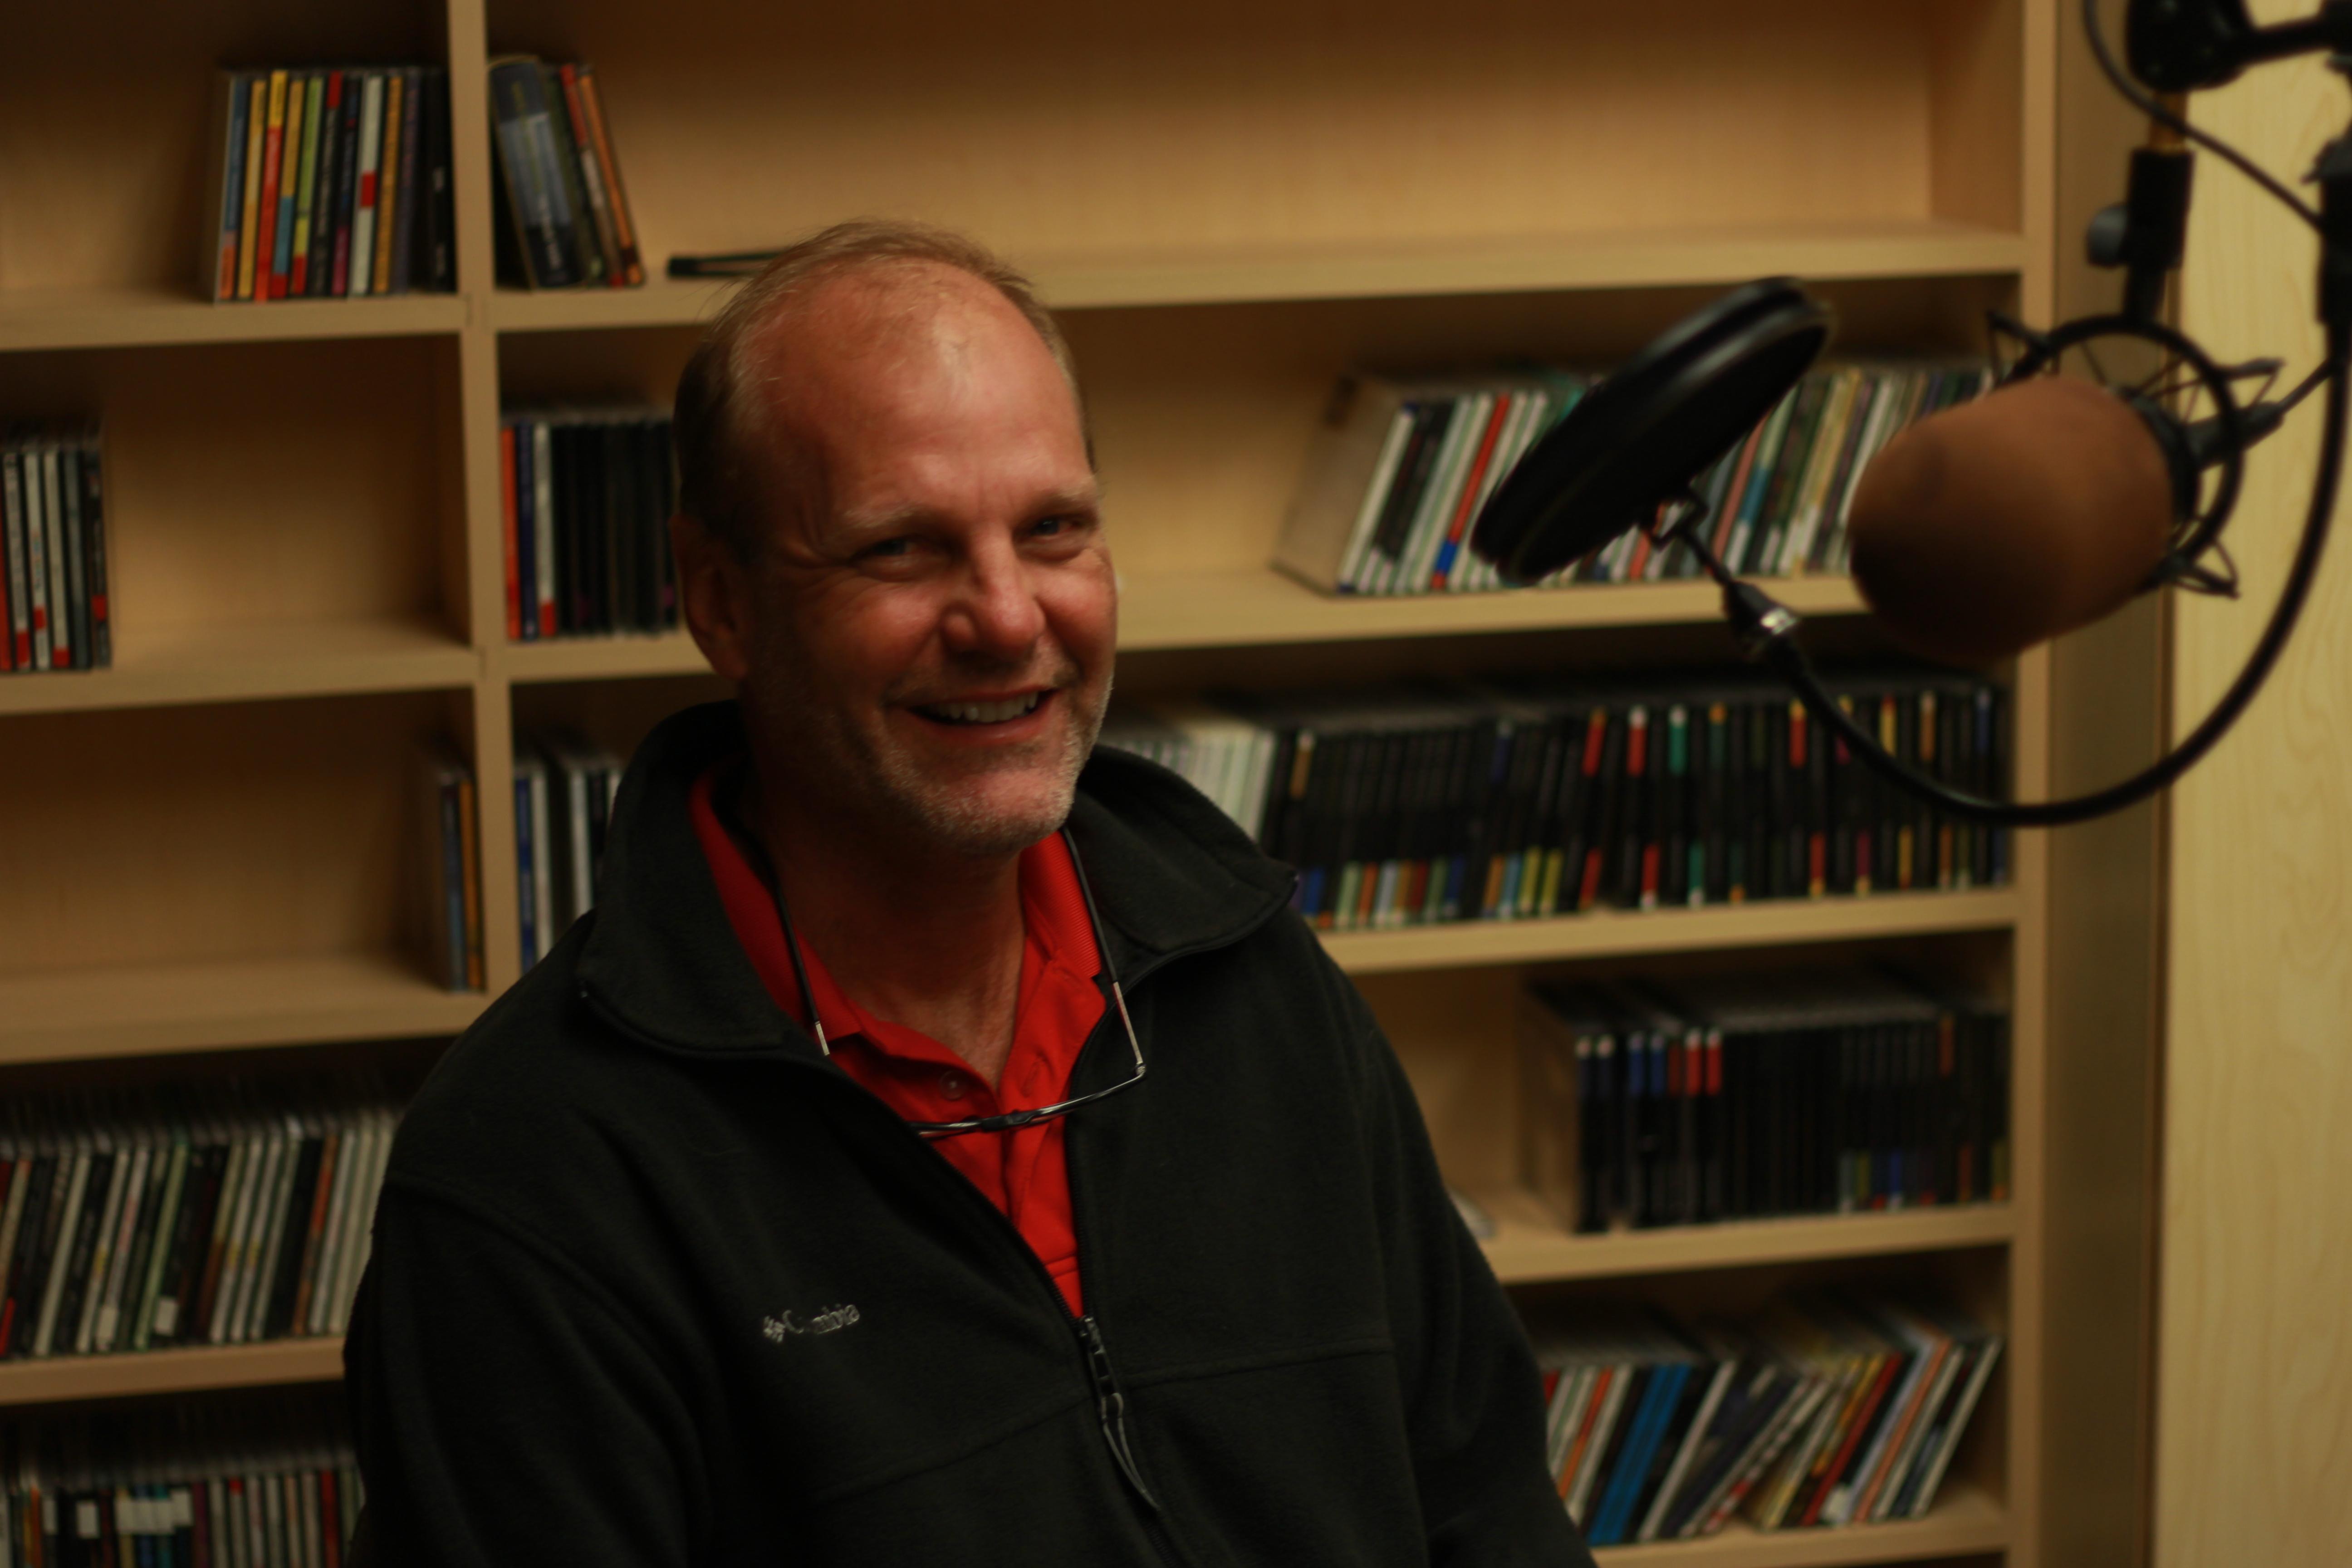 Bill Streever in studio for Talk of Alaska (Photo by Wesley Early, Alaska Public Media - Anchorage)